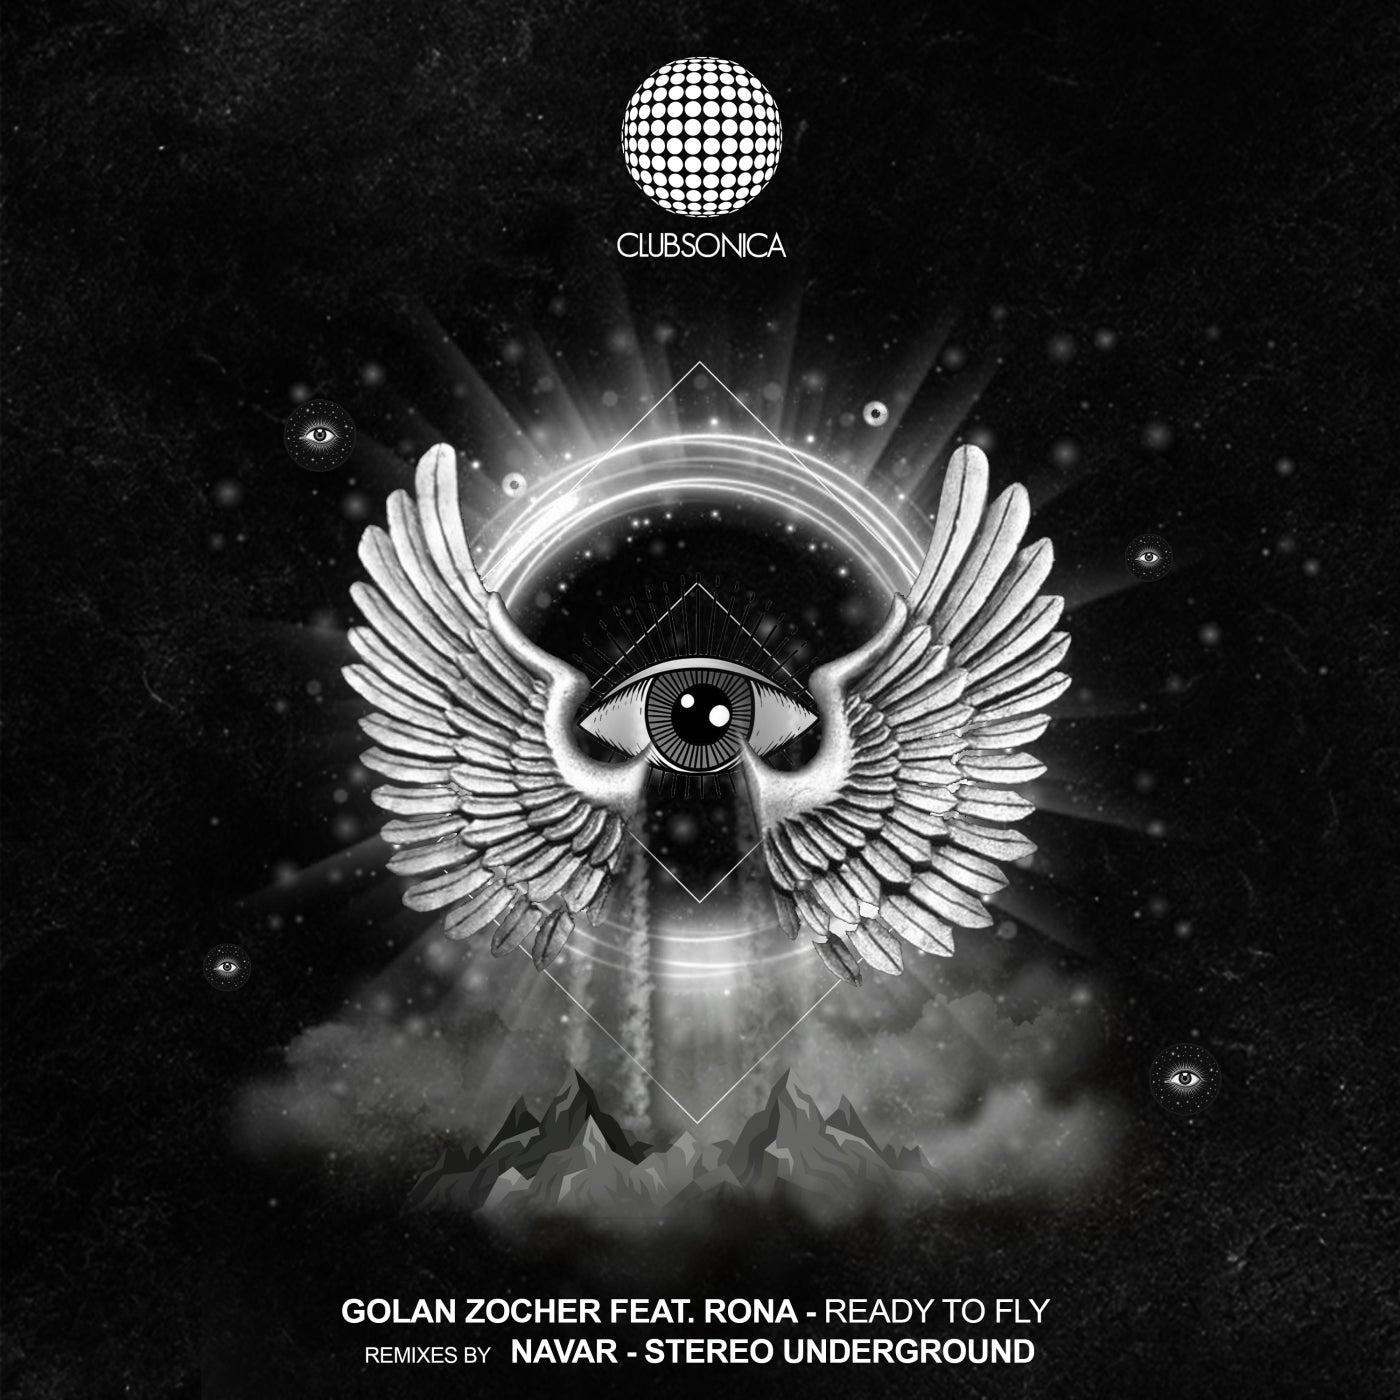 Ready to Fly feat. Rona (IL) (Navar Remix)